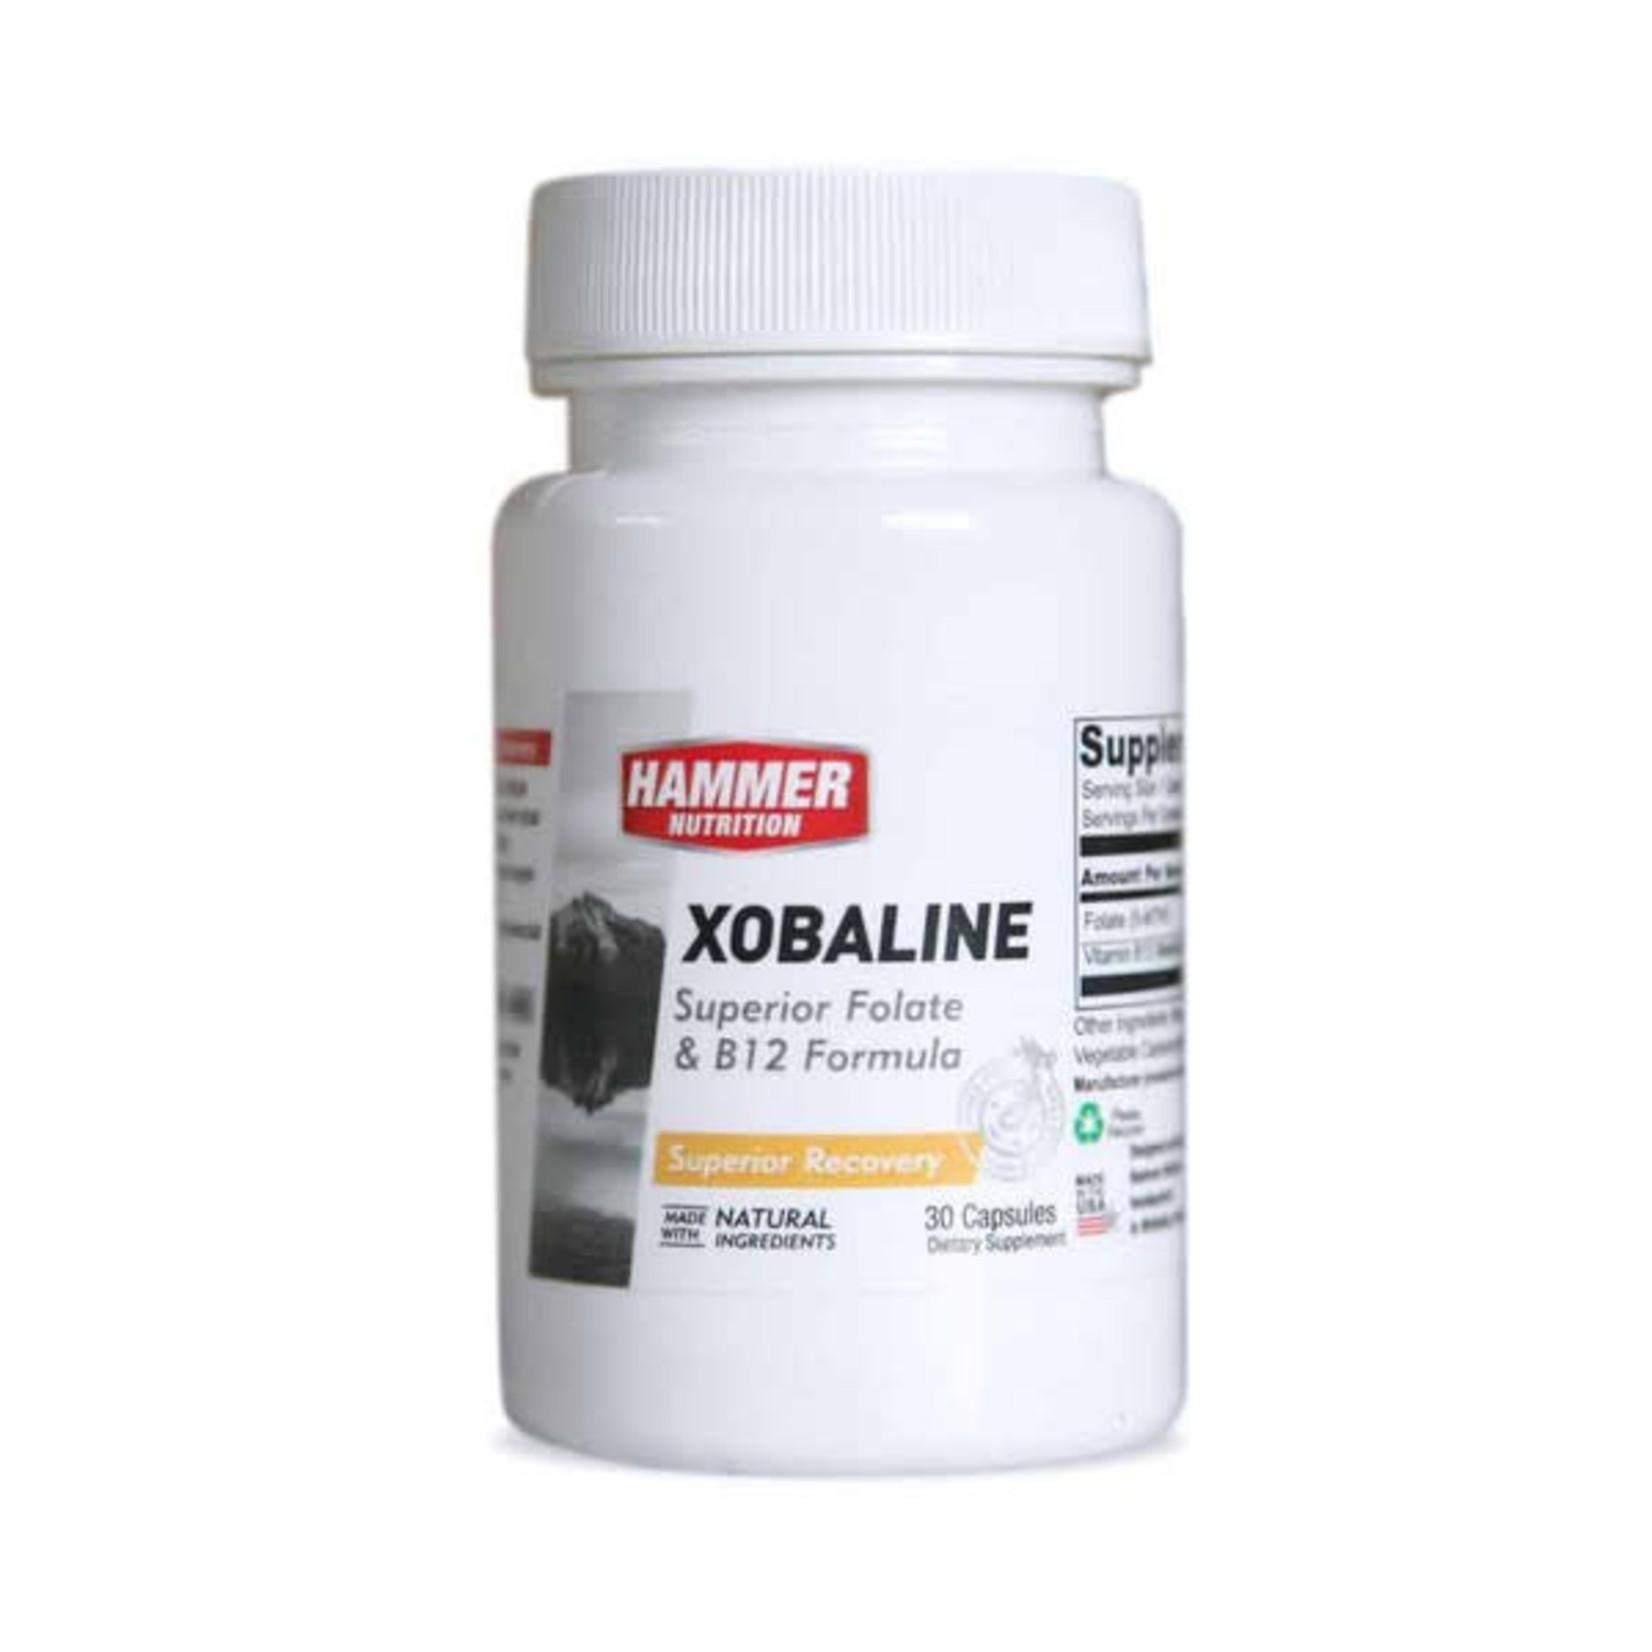 Hammer Nutrition Hammer Xobaline 30 capsules